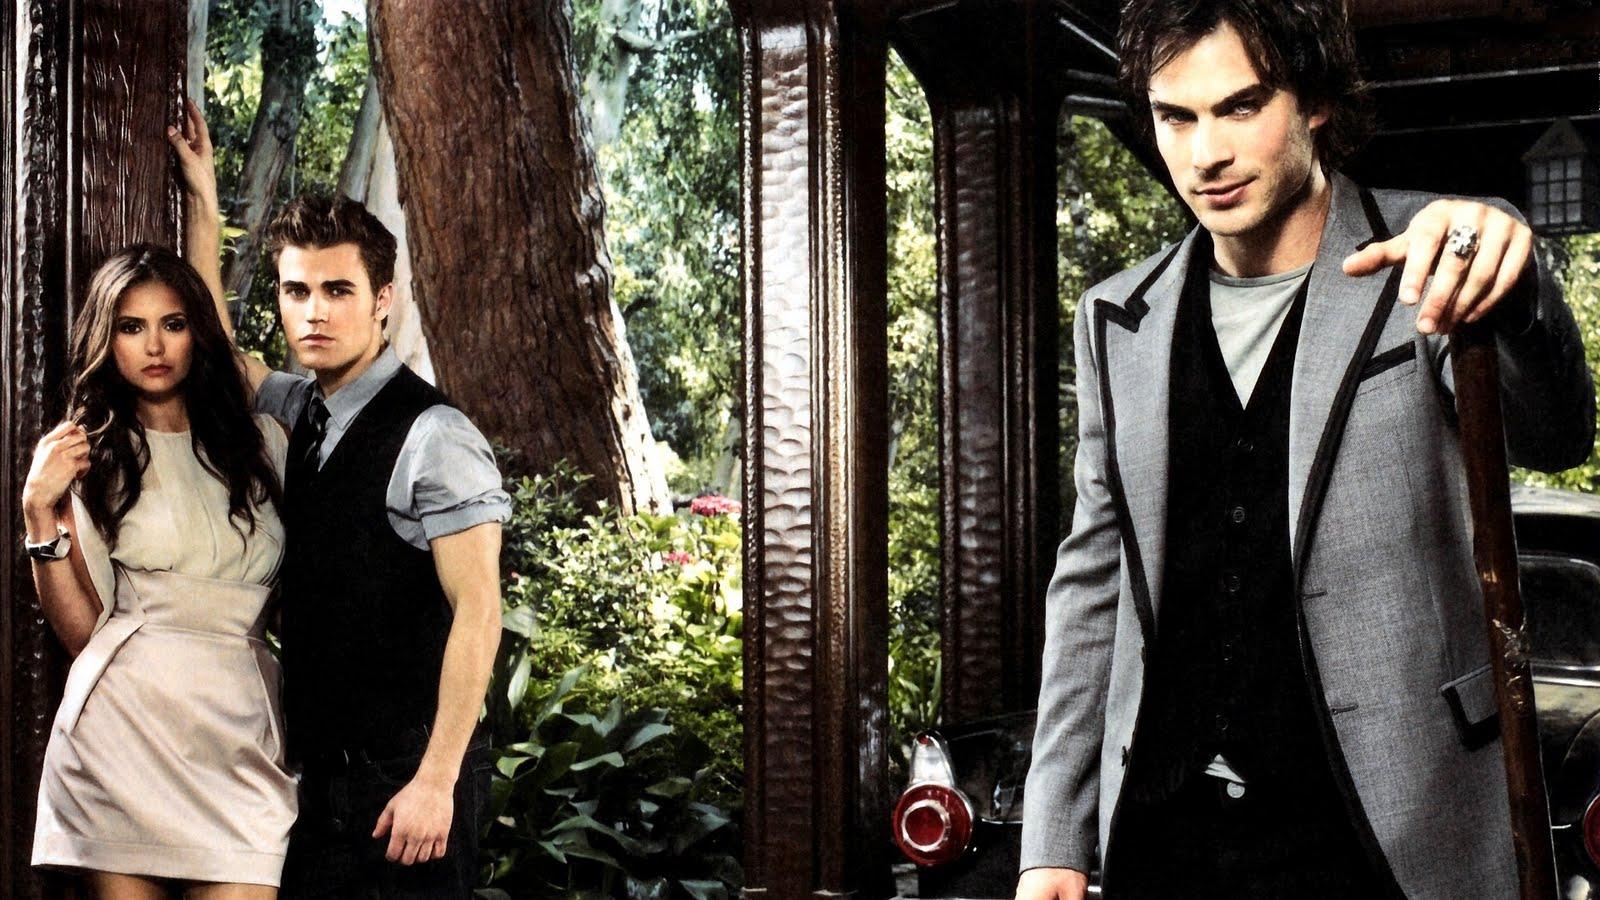 http://4.bp.blogspot.com/-1PHiy8lnYcY/TarAU-LI70I/AAAAAAAACQ0/UlC2sdmxfuY/s1600/the_vampire_diaries_wallpaper_11.jpg